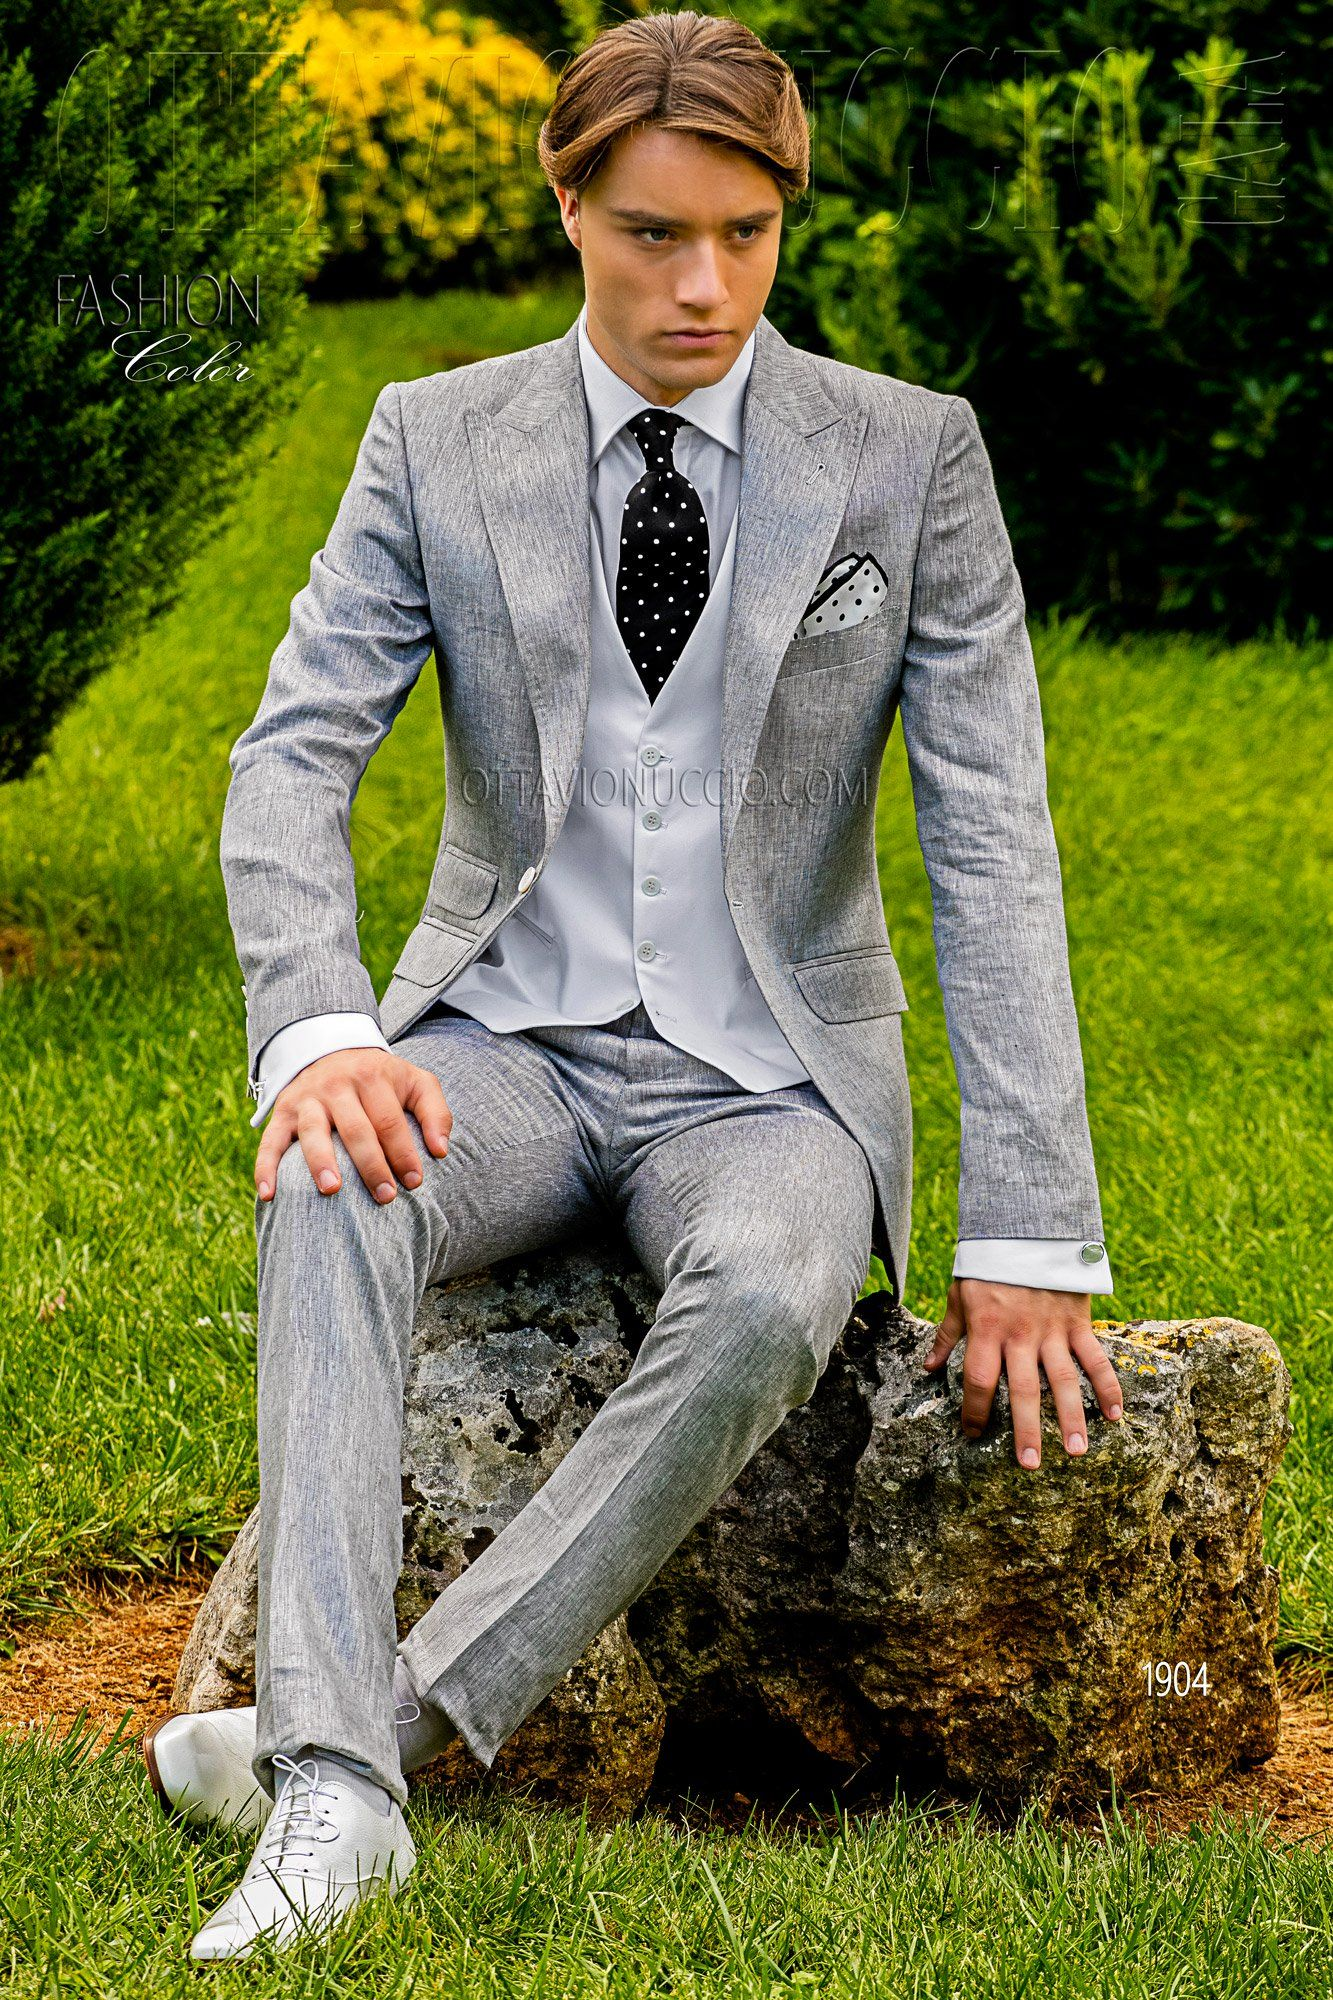 69263c9a9 Pure pearl gray linen Hipster suit #wedding #groom #tuxedo #luxury  #menswear #menstyle #dapper #madeinitaly #alternative #trend #bespoke